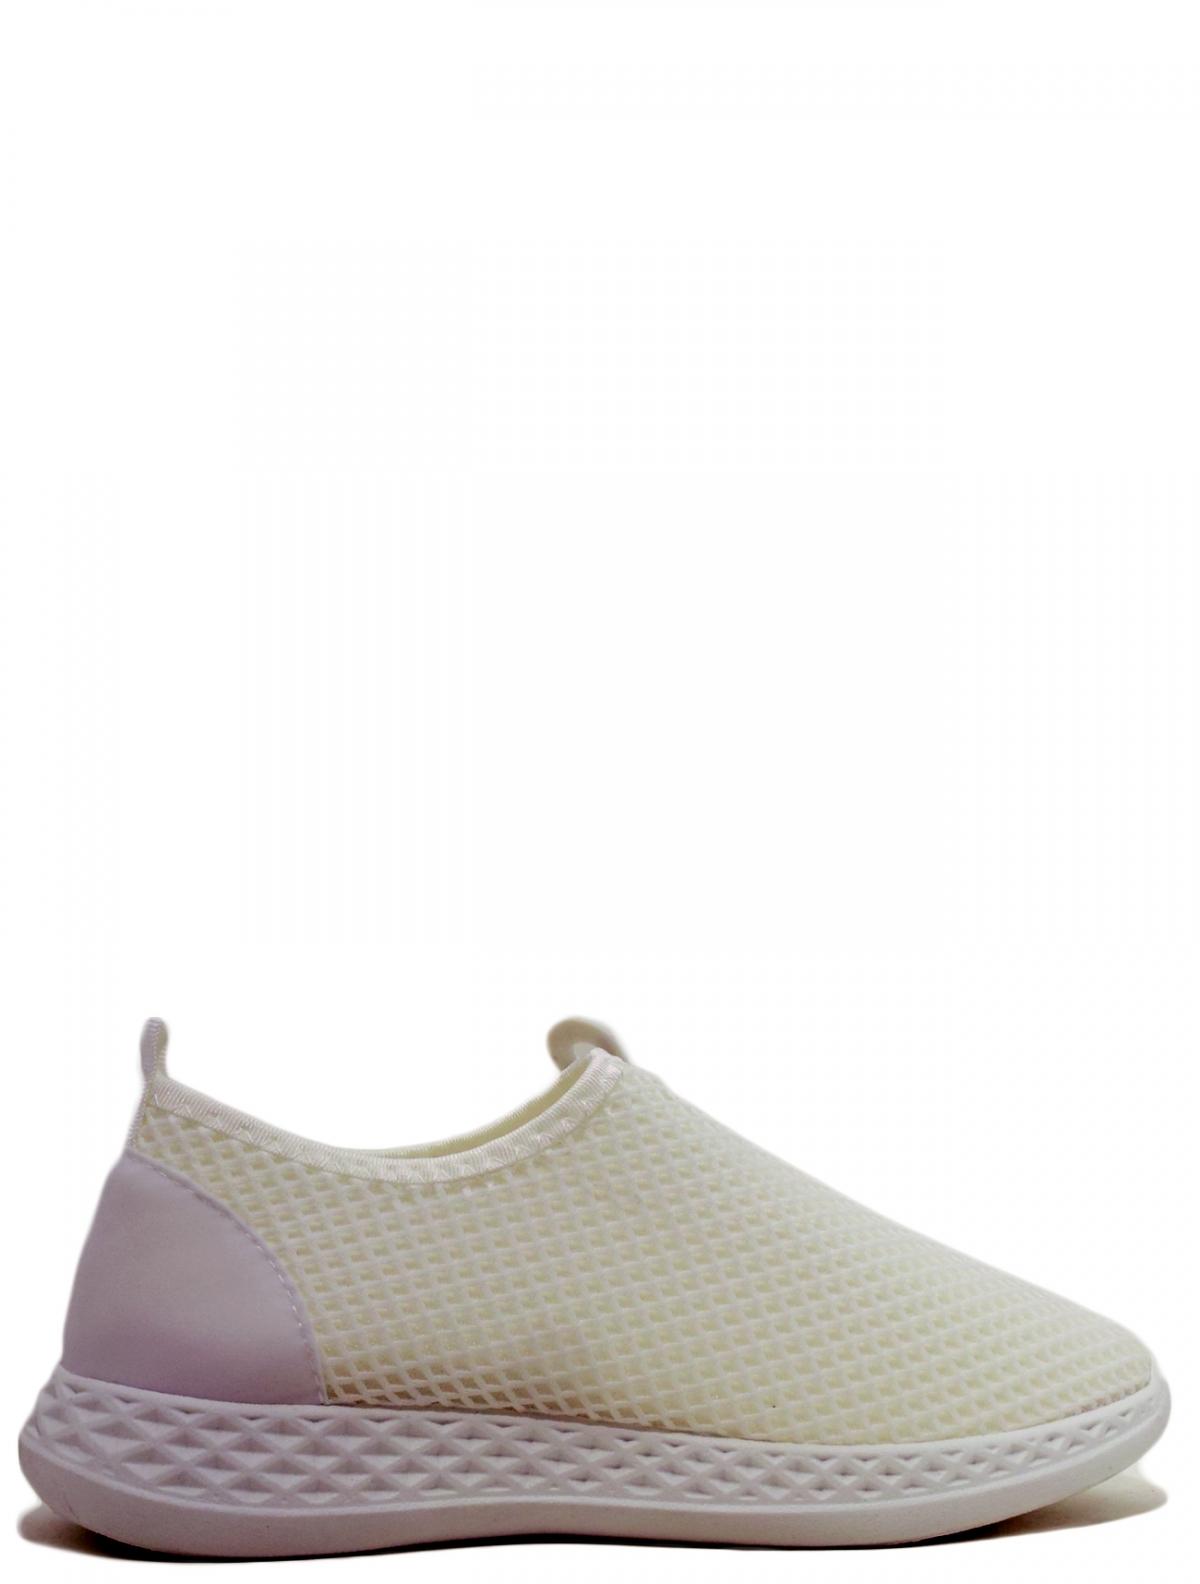 Trien SM-BM1901 женские кроссовки